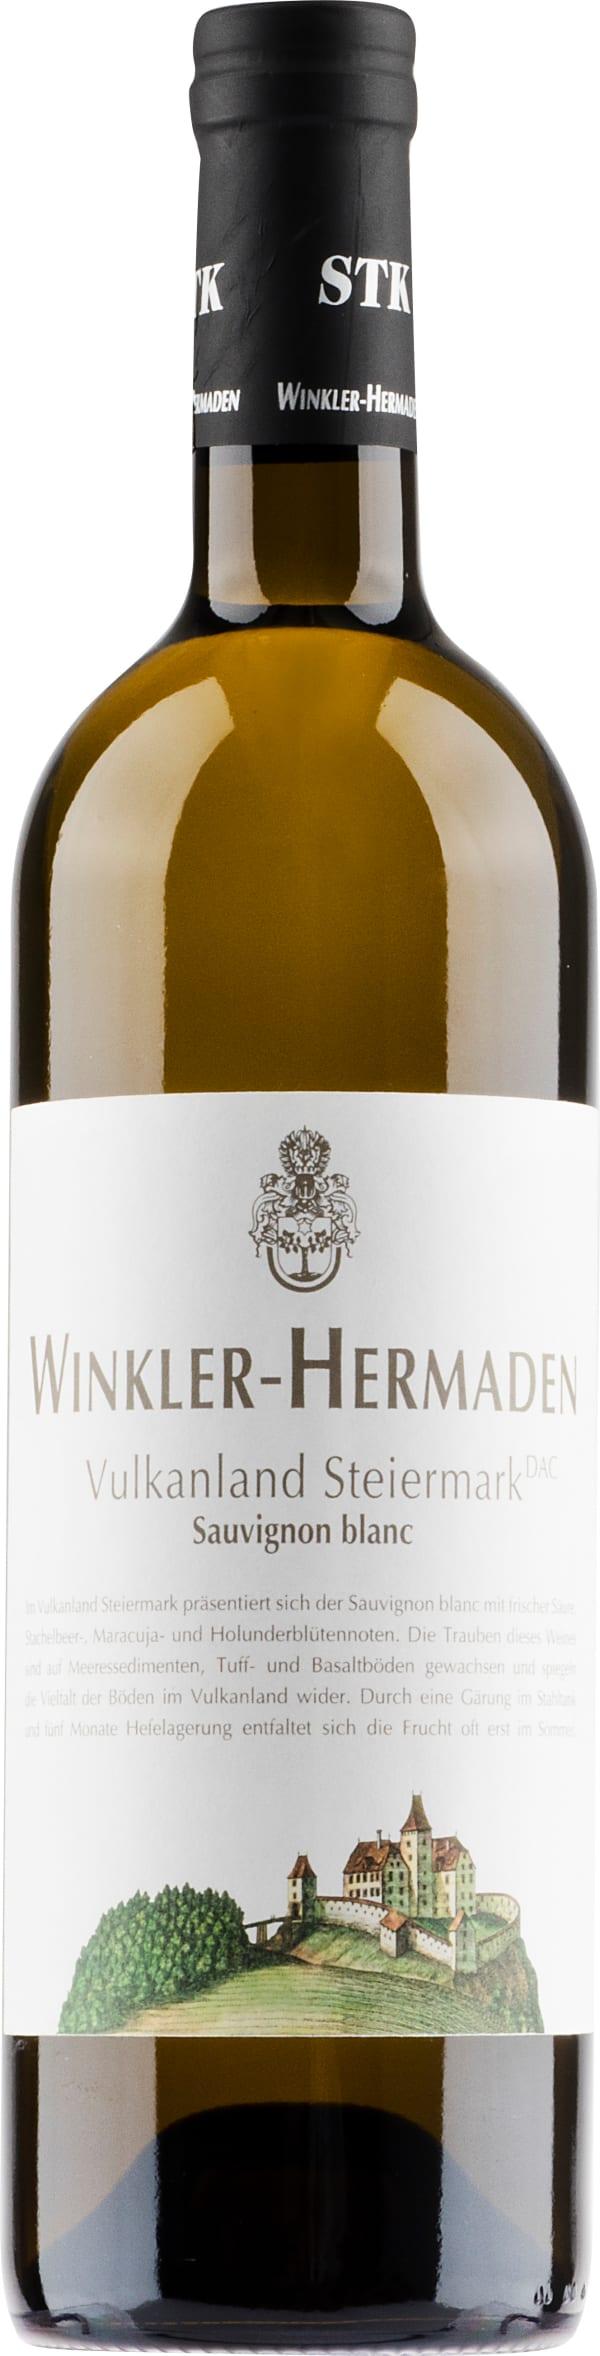 Winkler-Hermaden Sauvignon Blanc  2020